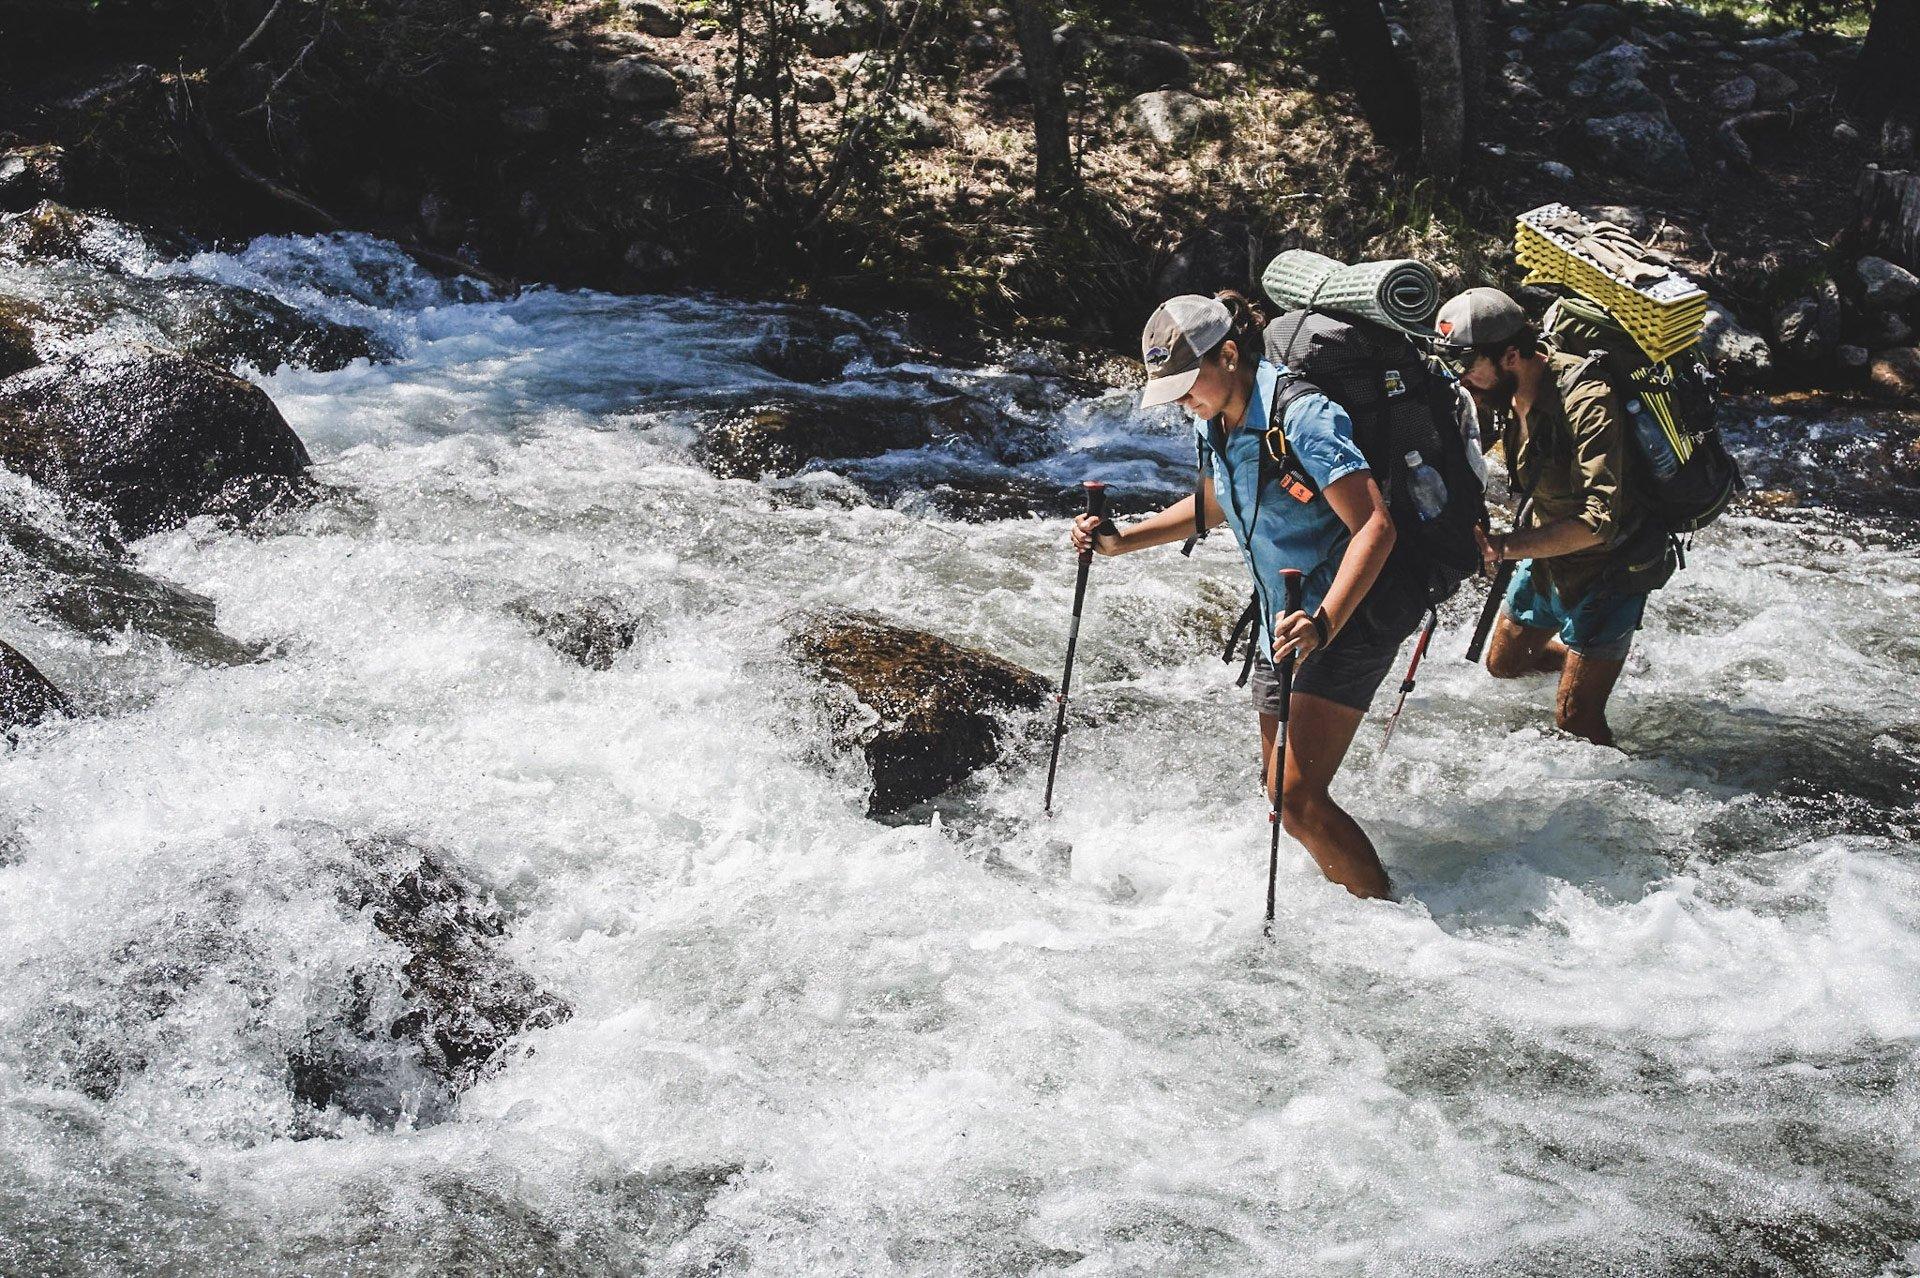 Do not swim against the stream, do not swim with the stream, swim where you want 96